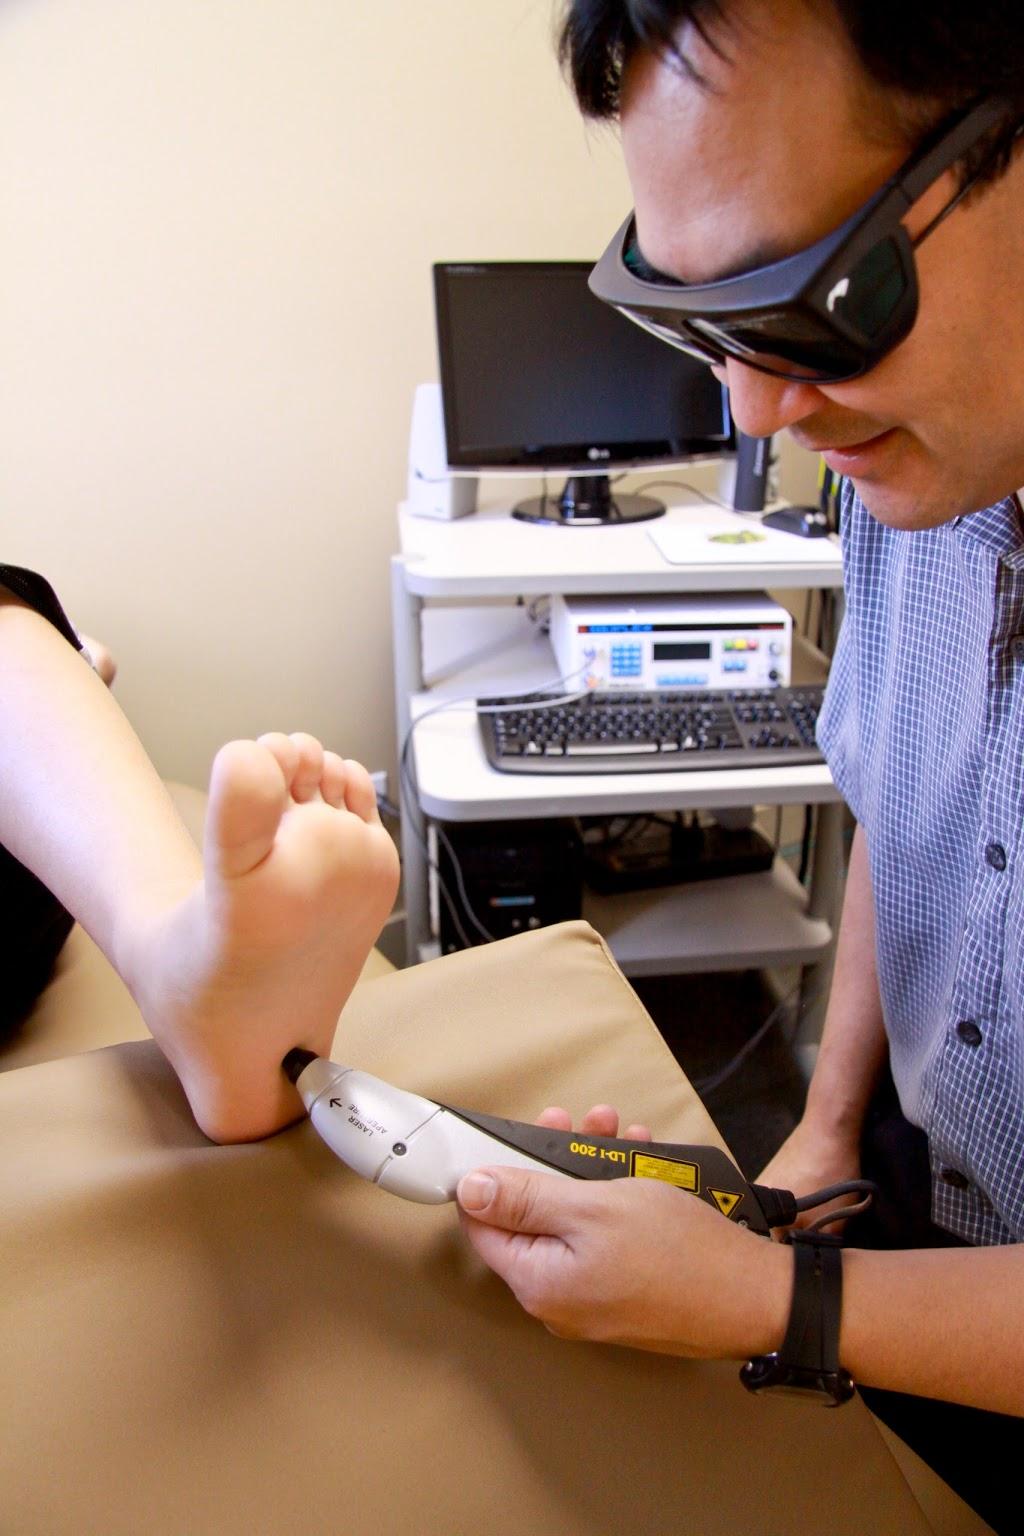 Kelowna Laser Therapy | health | 1824 Gordon Dr #204, Kelowna, BC V1Y 6A8, Canada | 2508604518 OR +1 250-860-4518